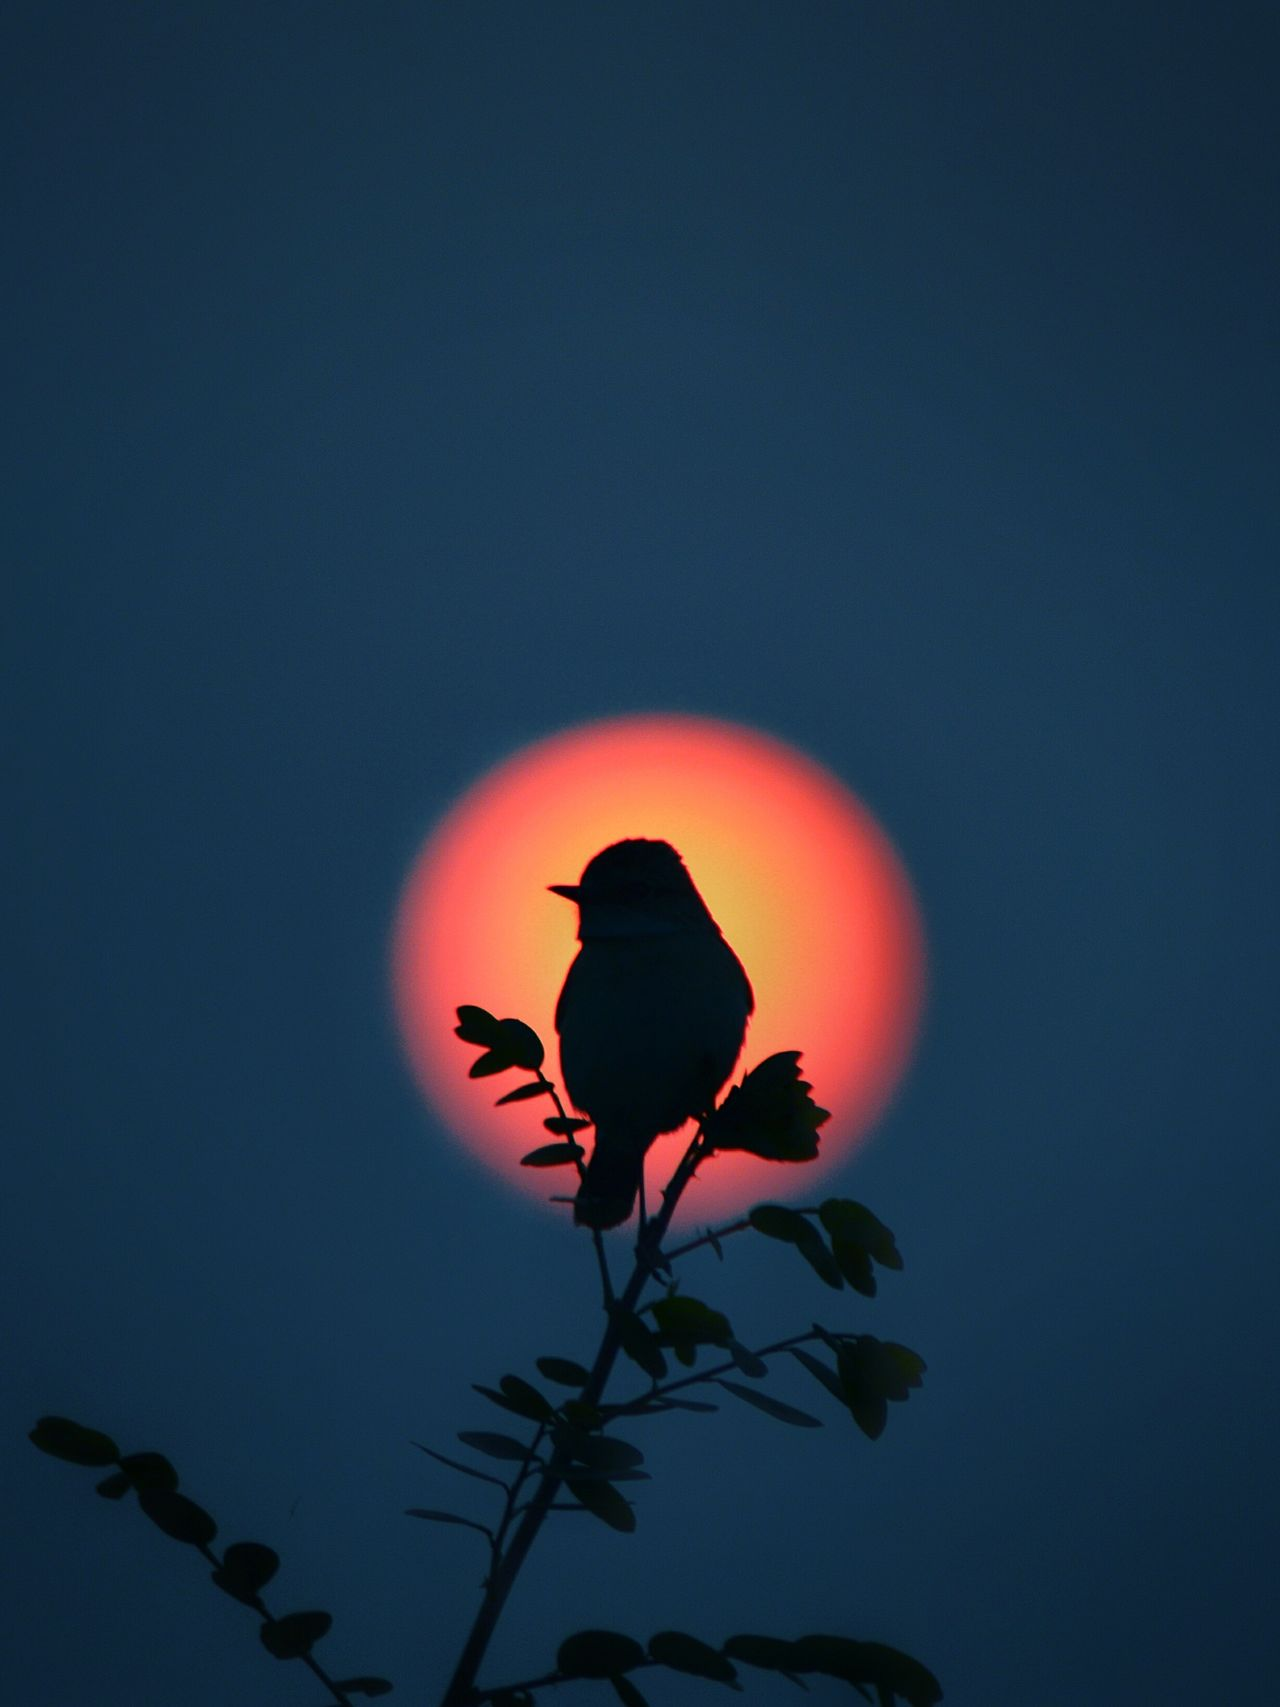 EyeEmNewHere Bird Sunrise Beauty In Nature Branch Sky Sunshine Sunlight Birds Of EyeEm  Nature EyeEmBestPics EyeEm Gallery EyeEm Best Edits Outdoors Eyemmarket EyeEm Best Shots - Nature